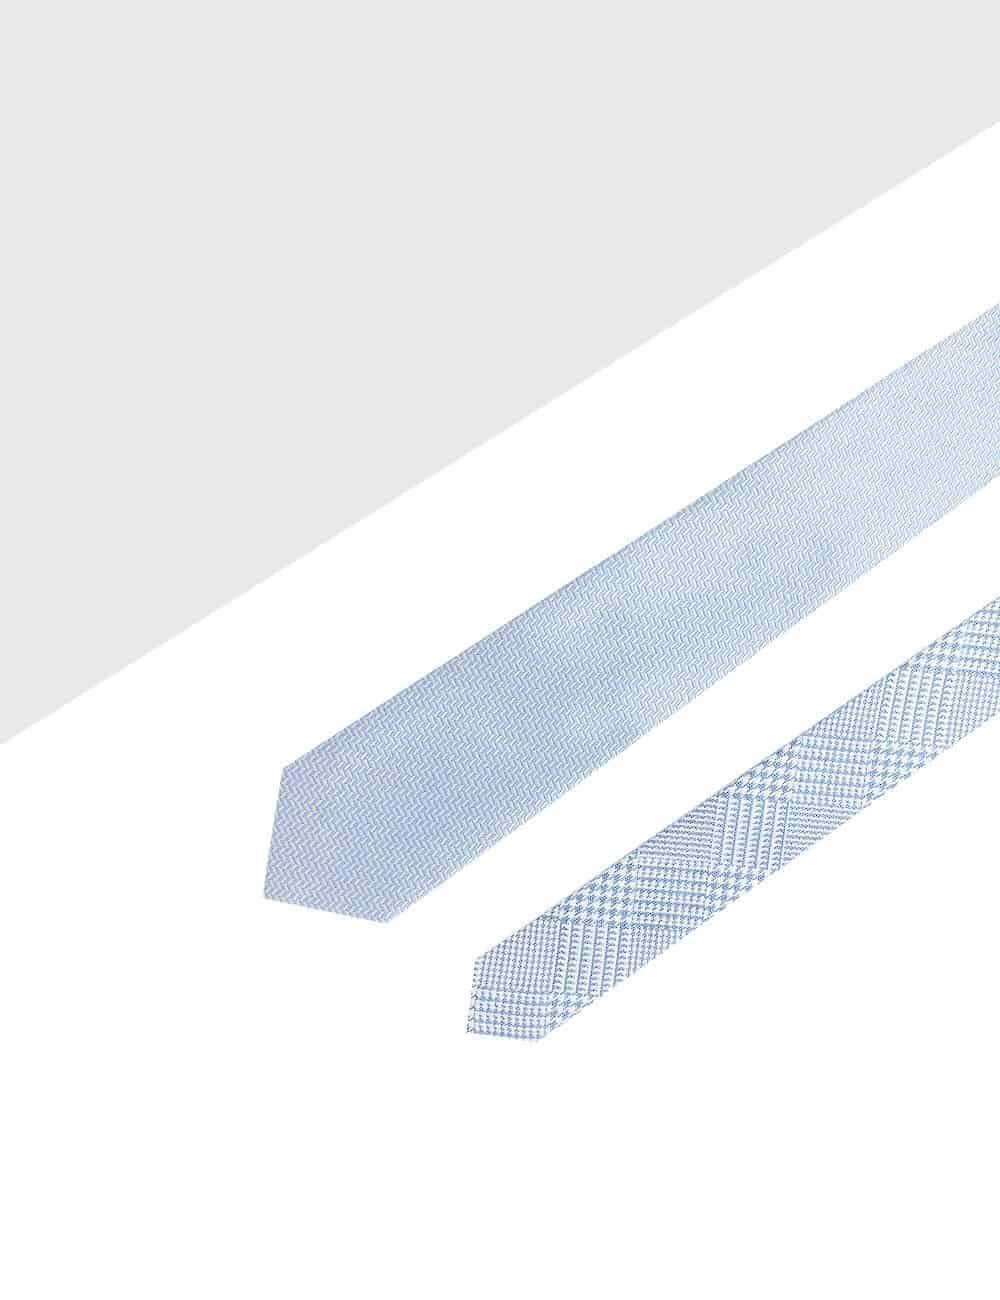 Grey Herringbone Spill Resist Woven Reversible Necktie RNT8.9